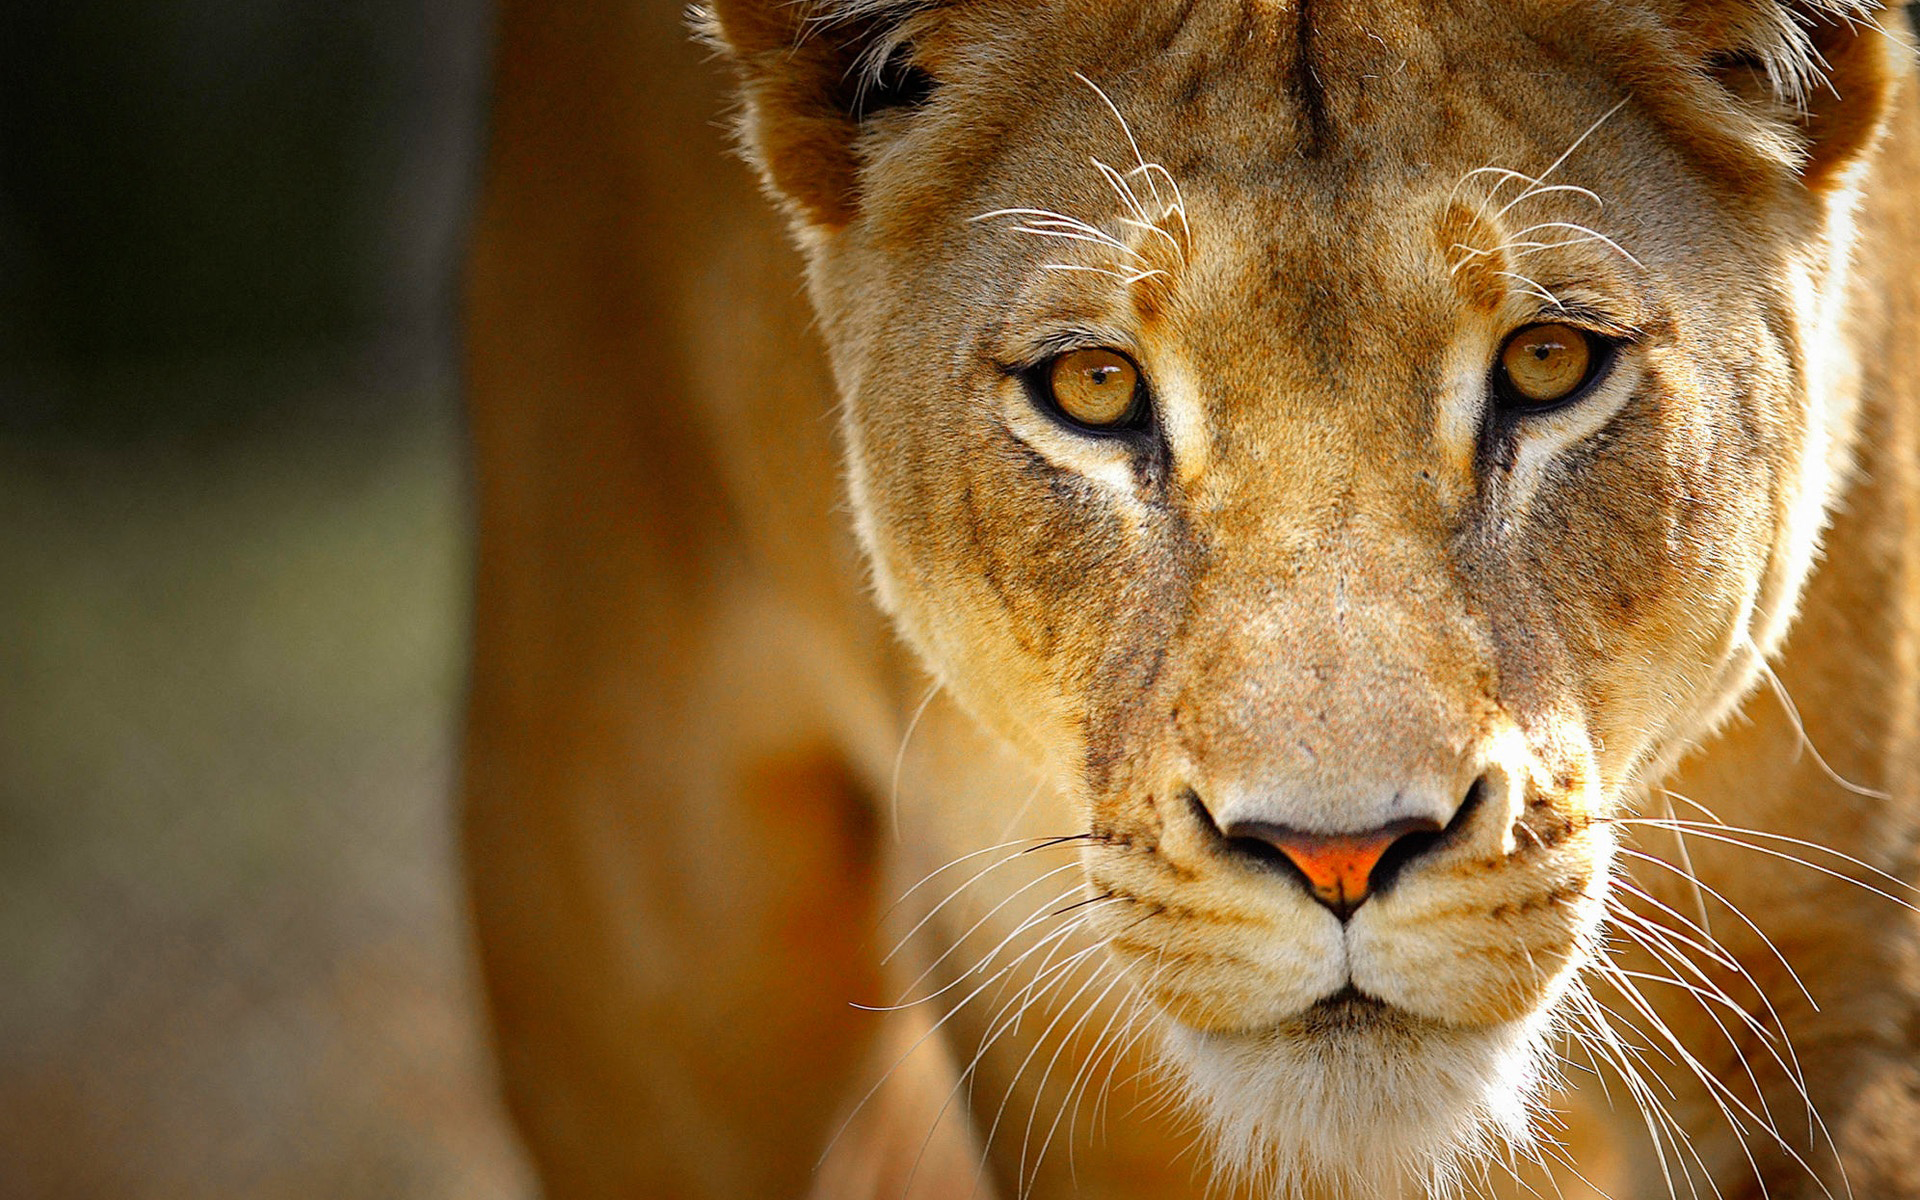 animal close up background